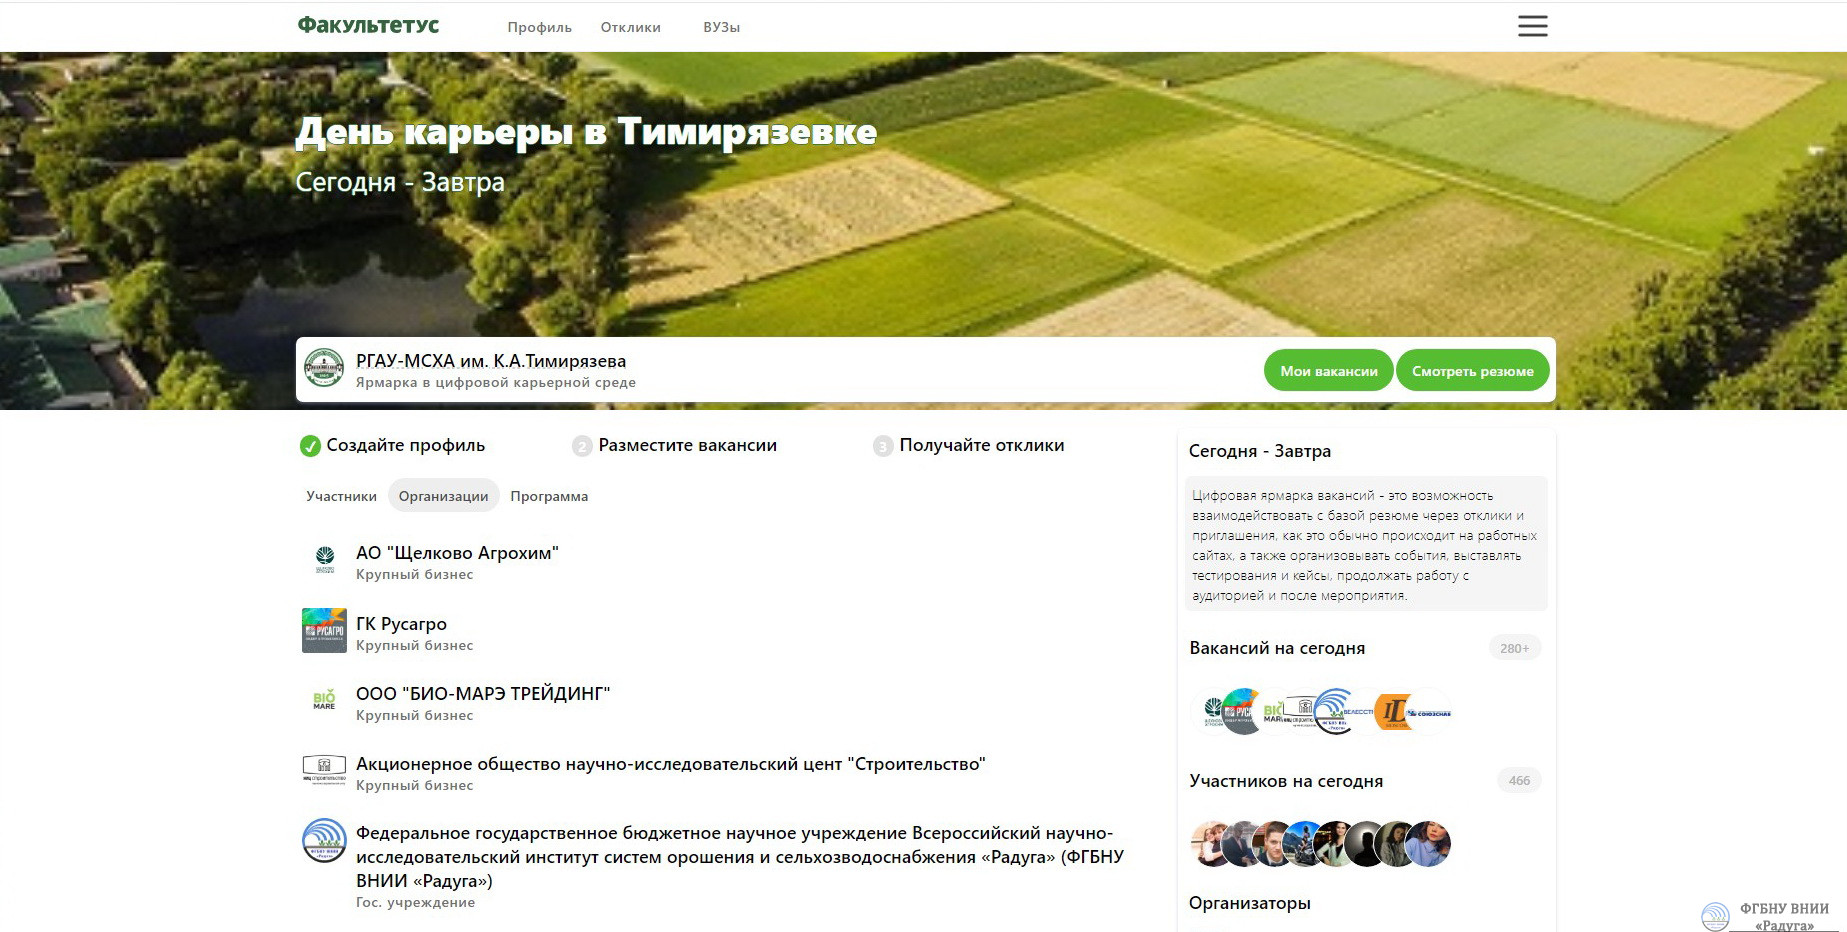 ВНИИ «Радуга» приняло участие в «Дне карьеры в Тимирязевке» в онлайн-формате